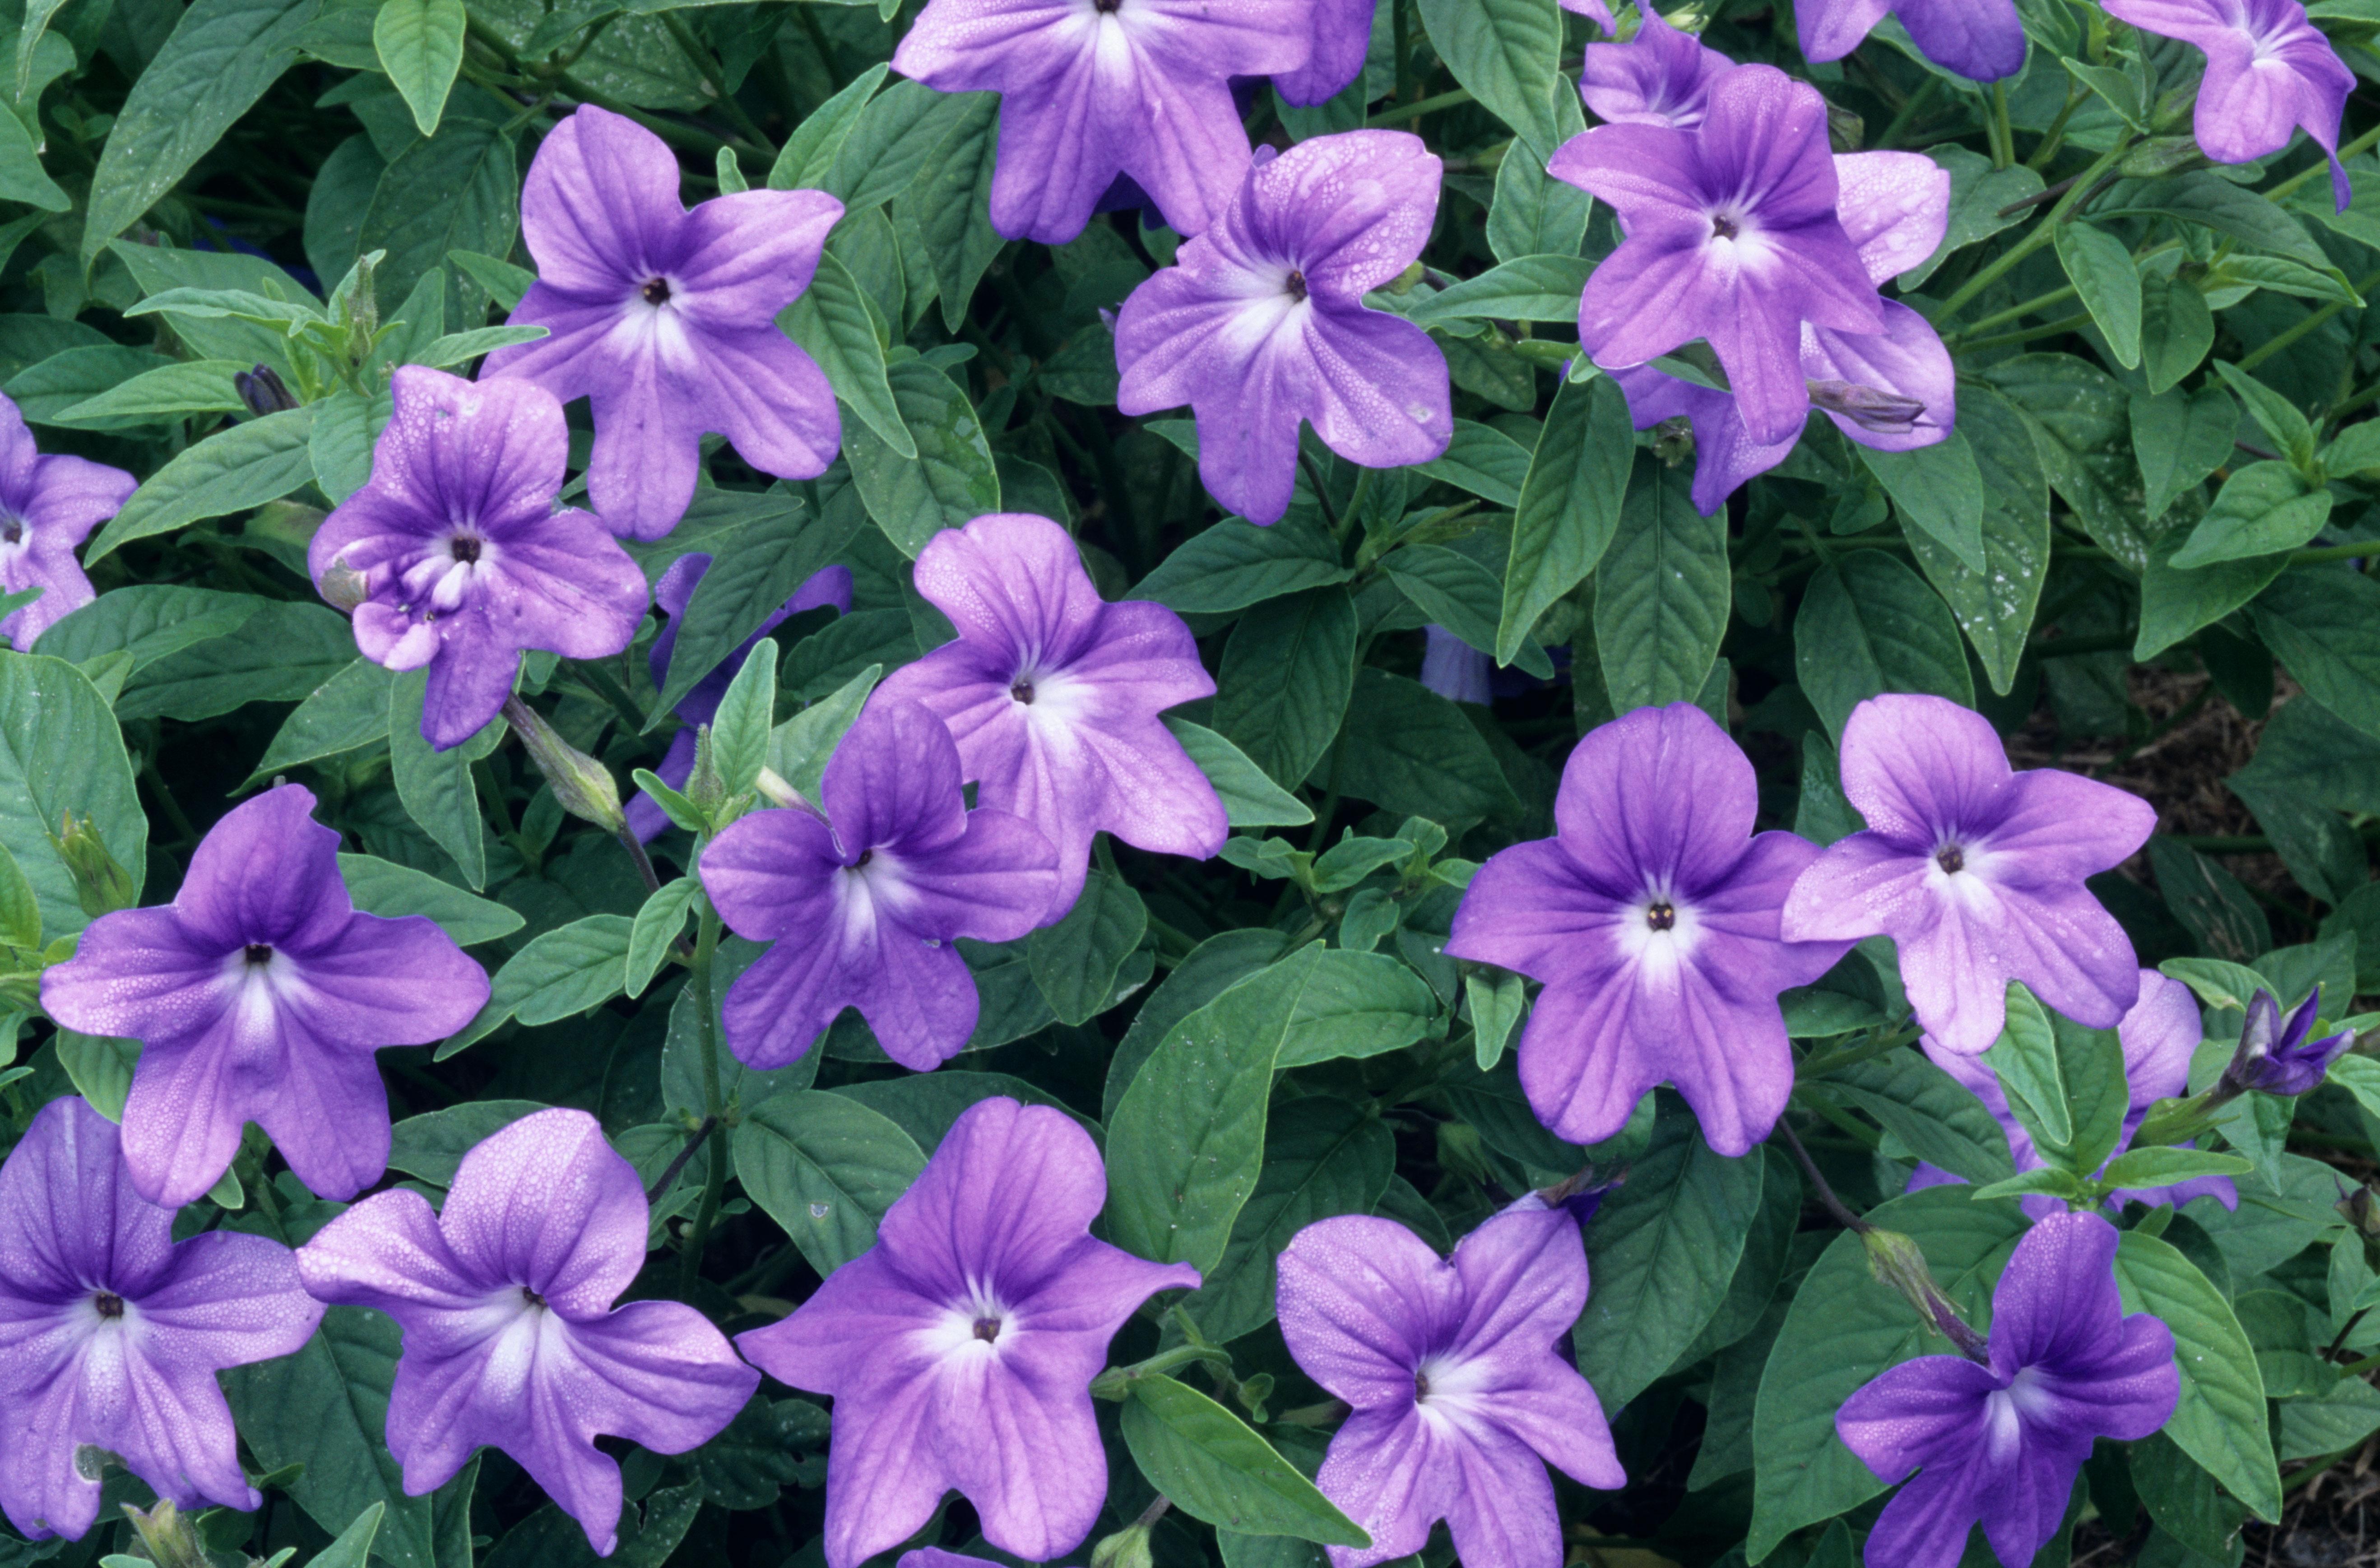 19 colorful plants for shade gardens sunset magazine amethyst flower browallia hybrids mightylinksfo